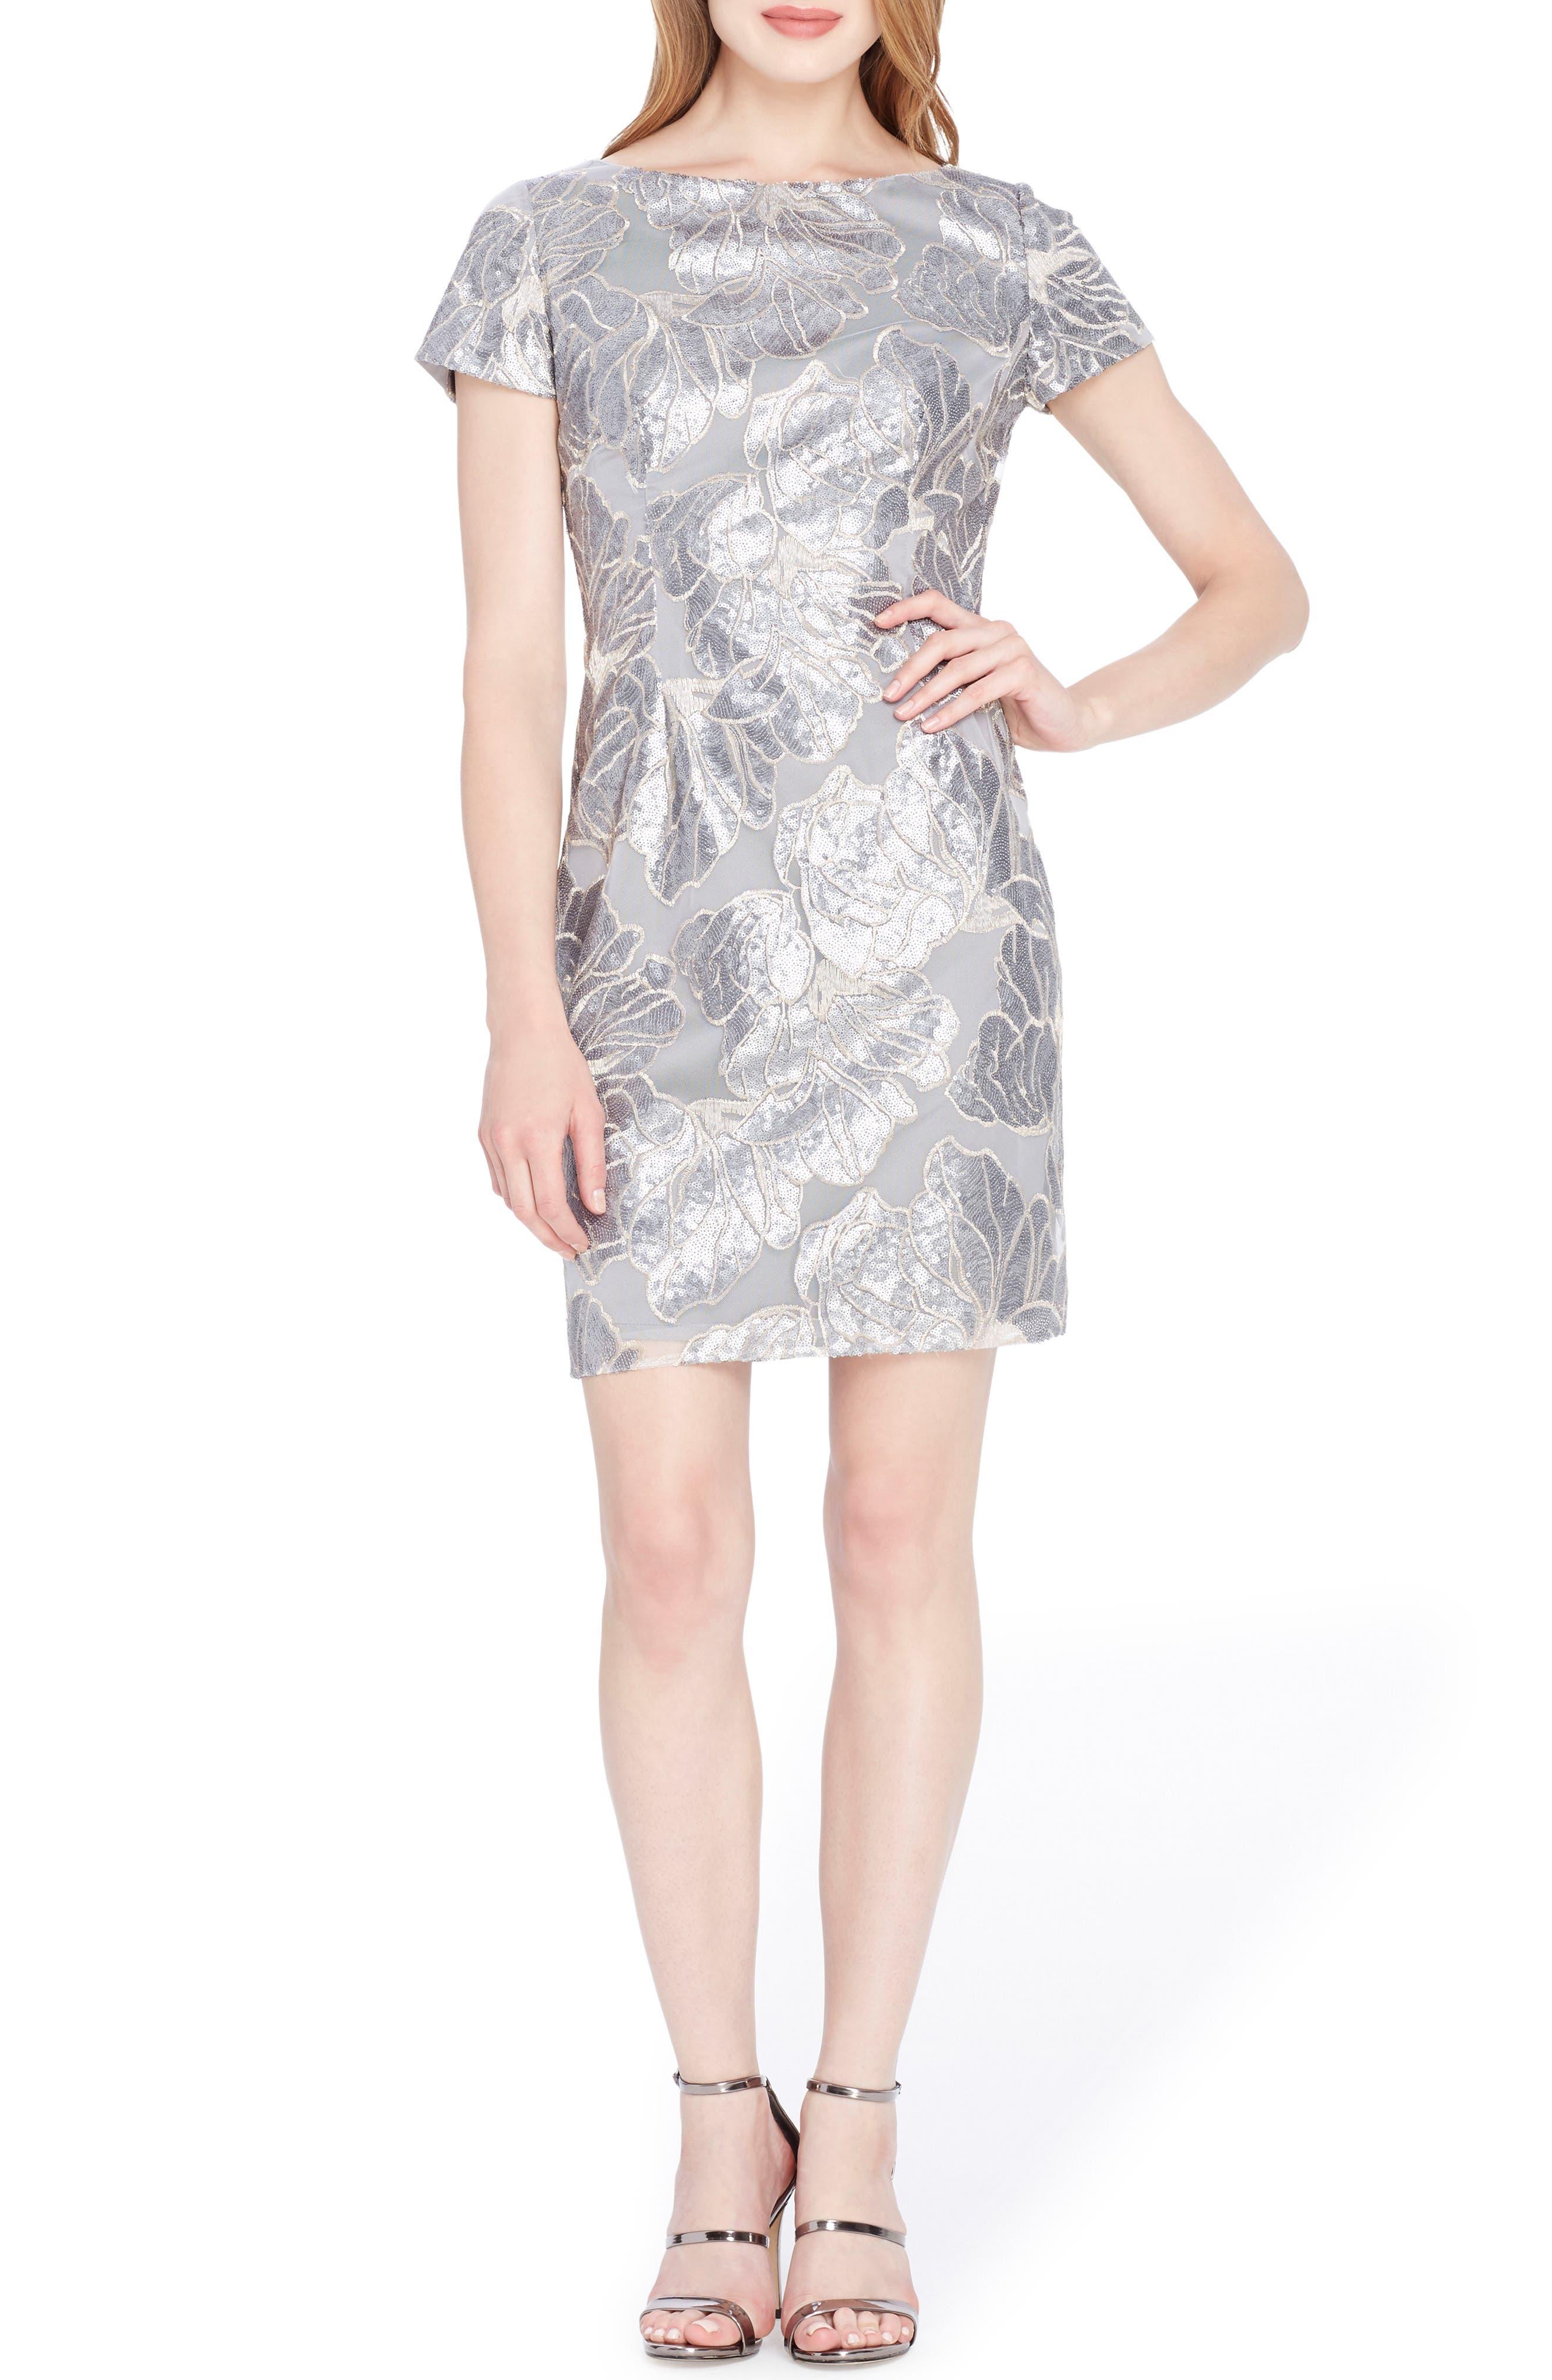 Tahari Sequin Floral Sheath Dress